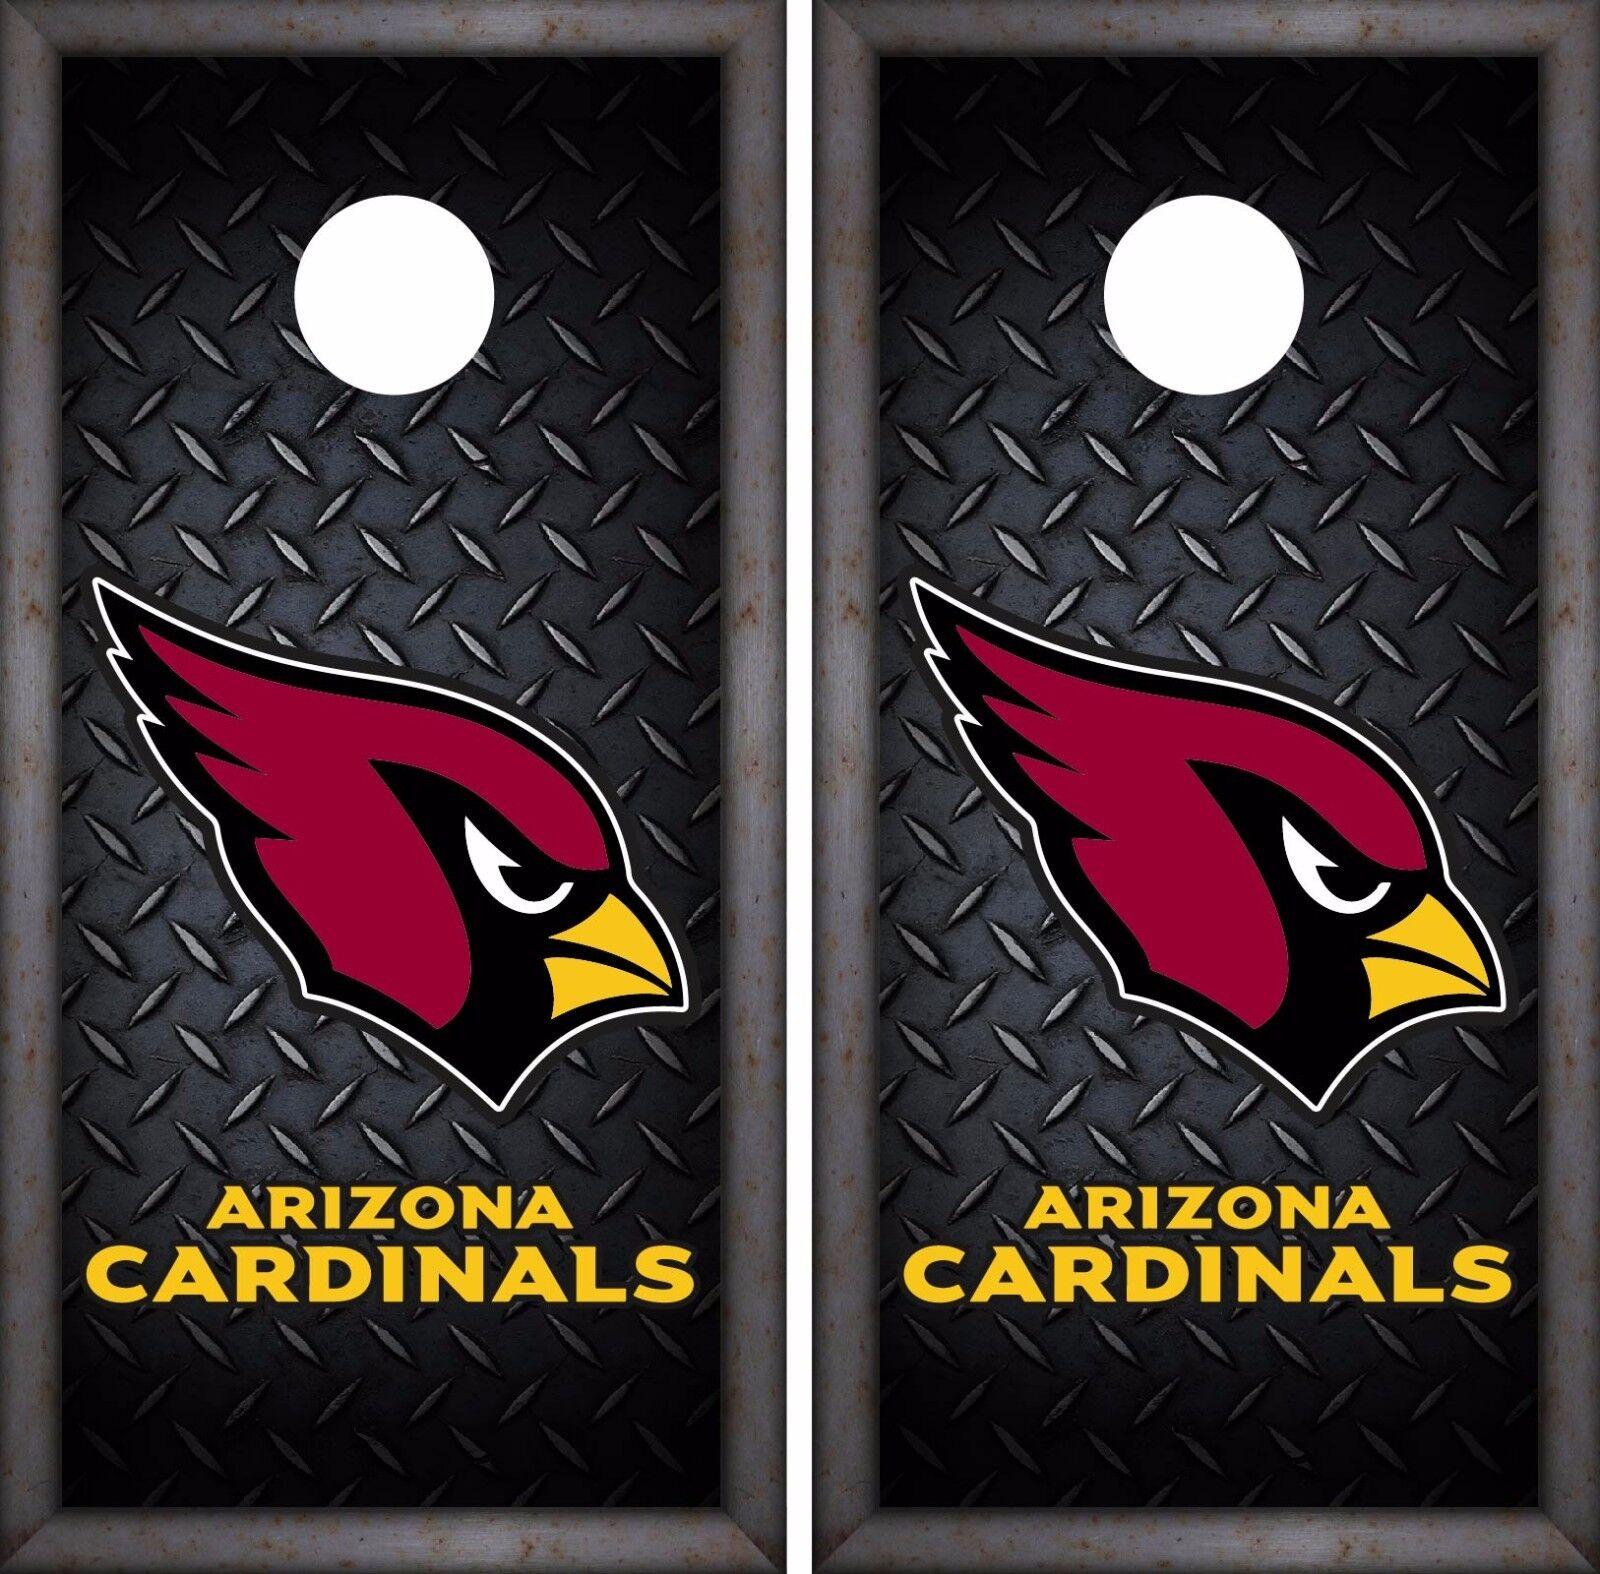 Arizona Cardinals Cornhole Skin Wrap NFL Team Football Luxury Decal Vinyl DR01